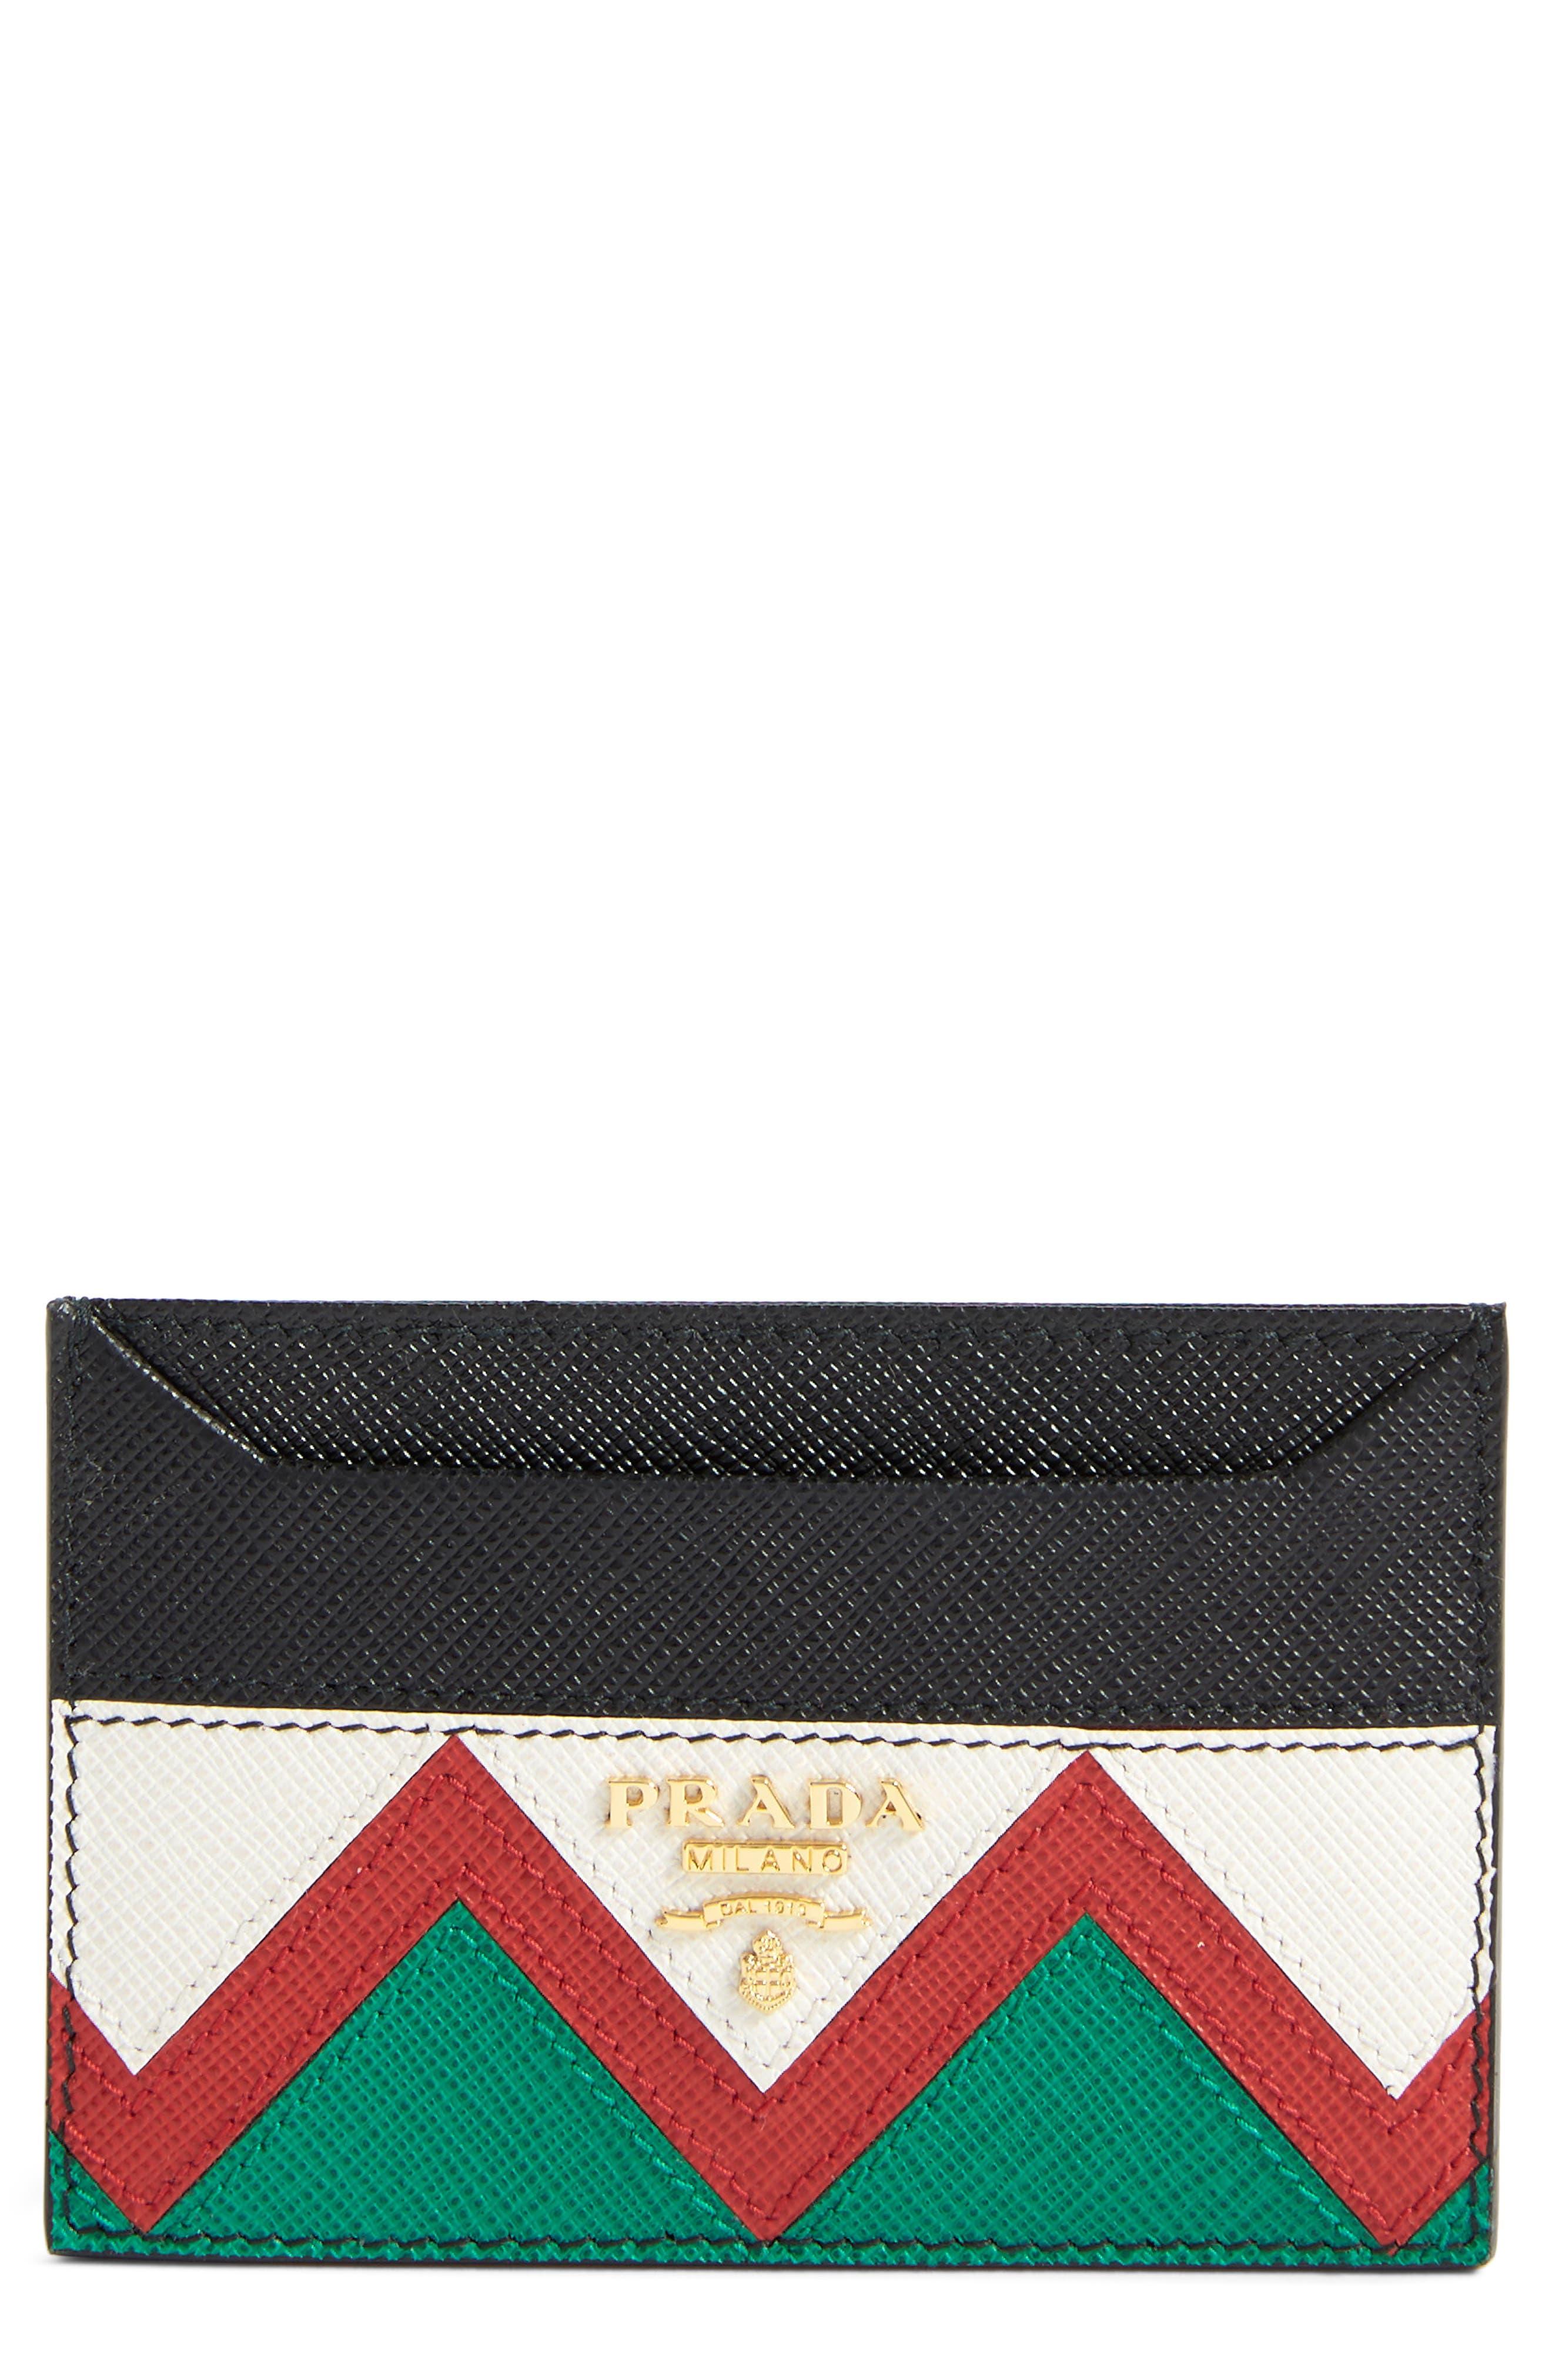 PRADA,                             Saffiano Leather Card Case,                             Main thumbnail 1, color,                             F0N98 NERO/ROSSO